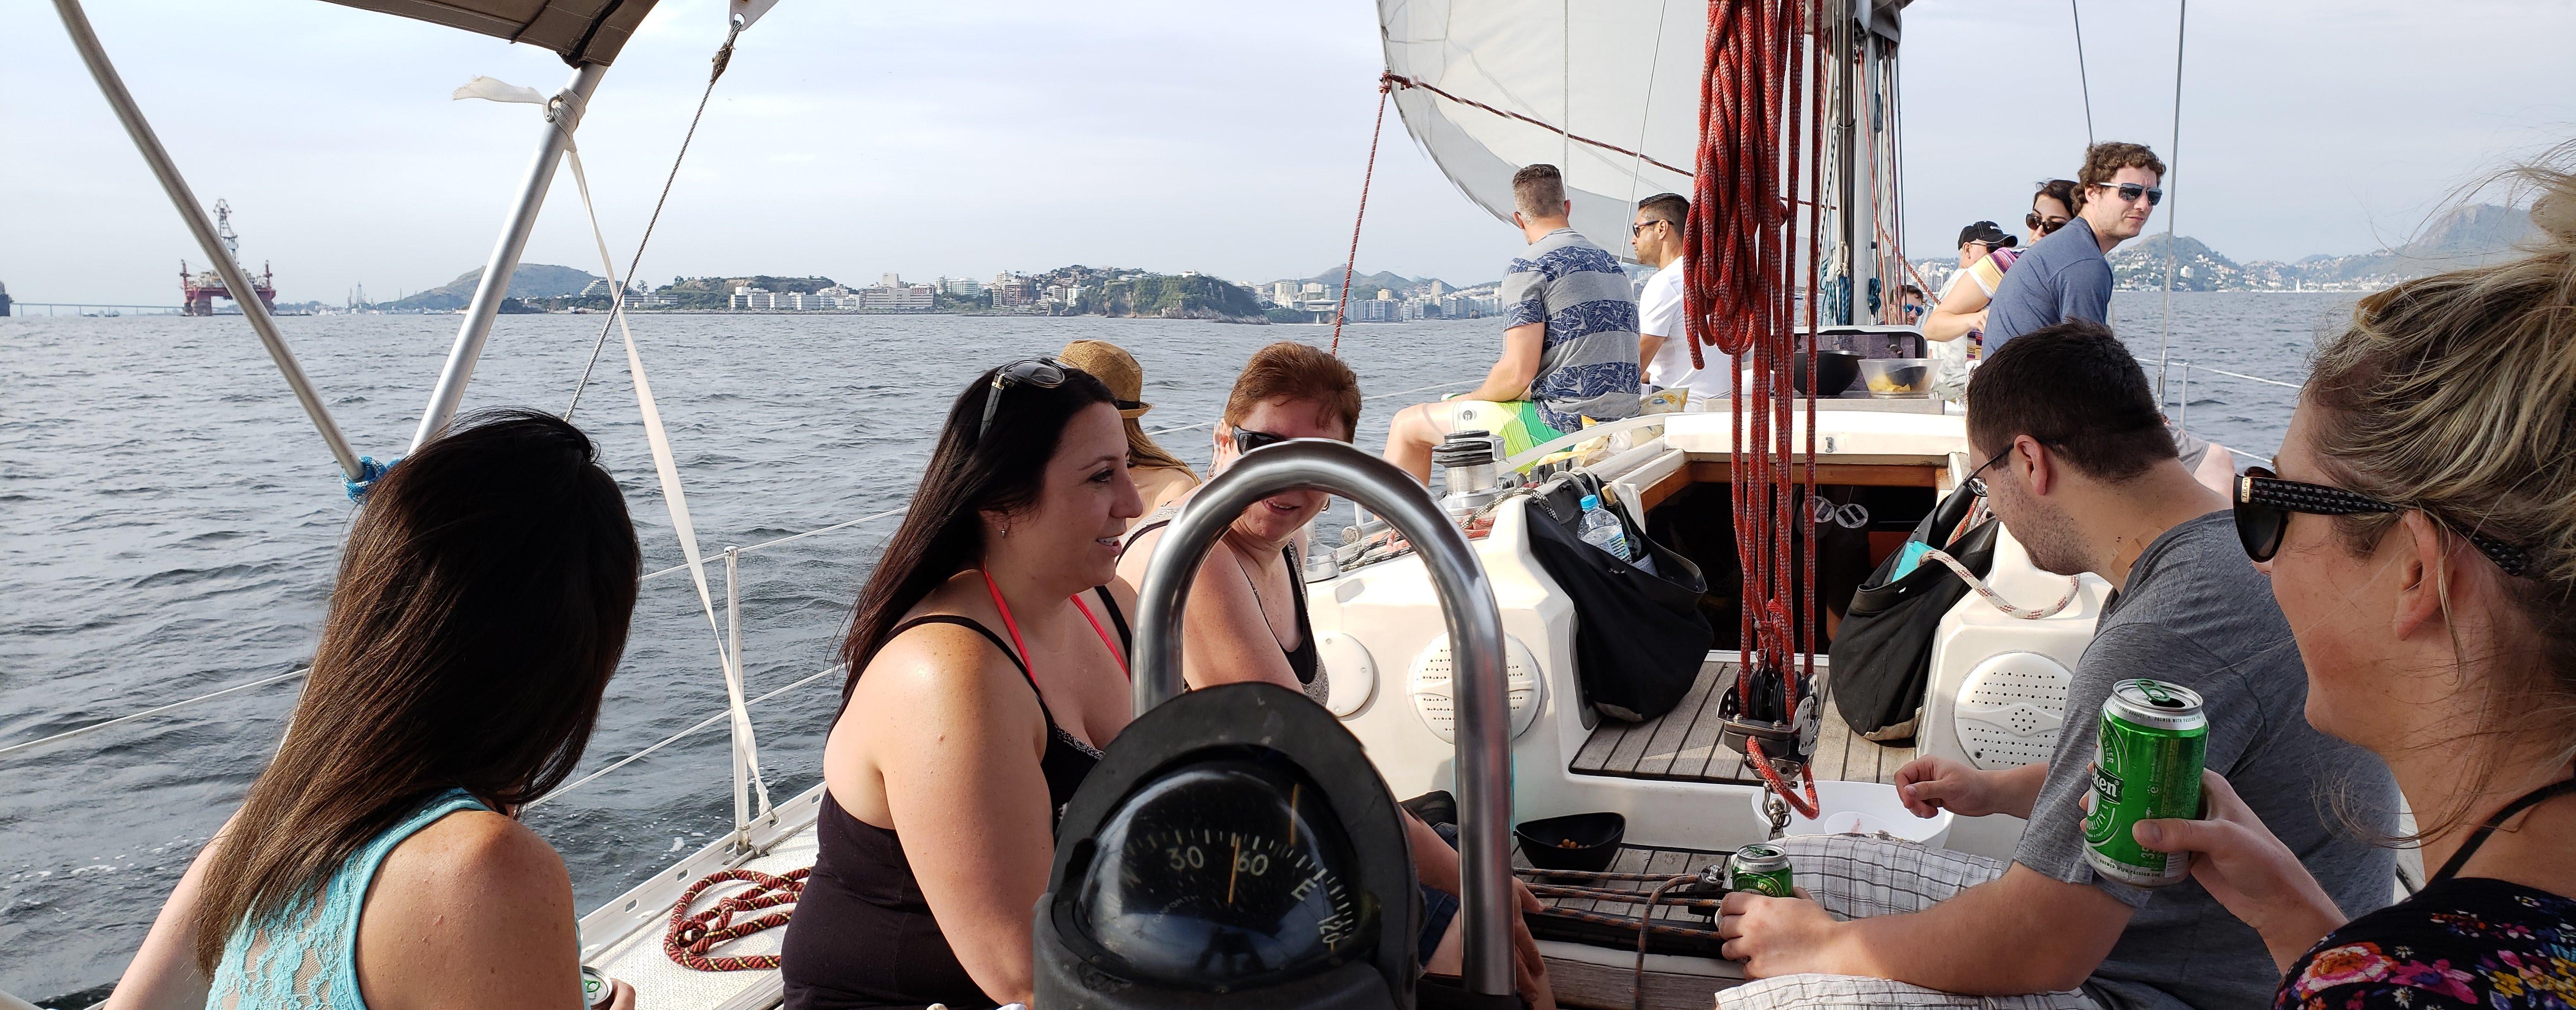 Ride on a private yacht along the Rio Grande